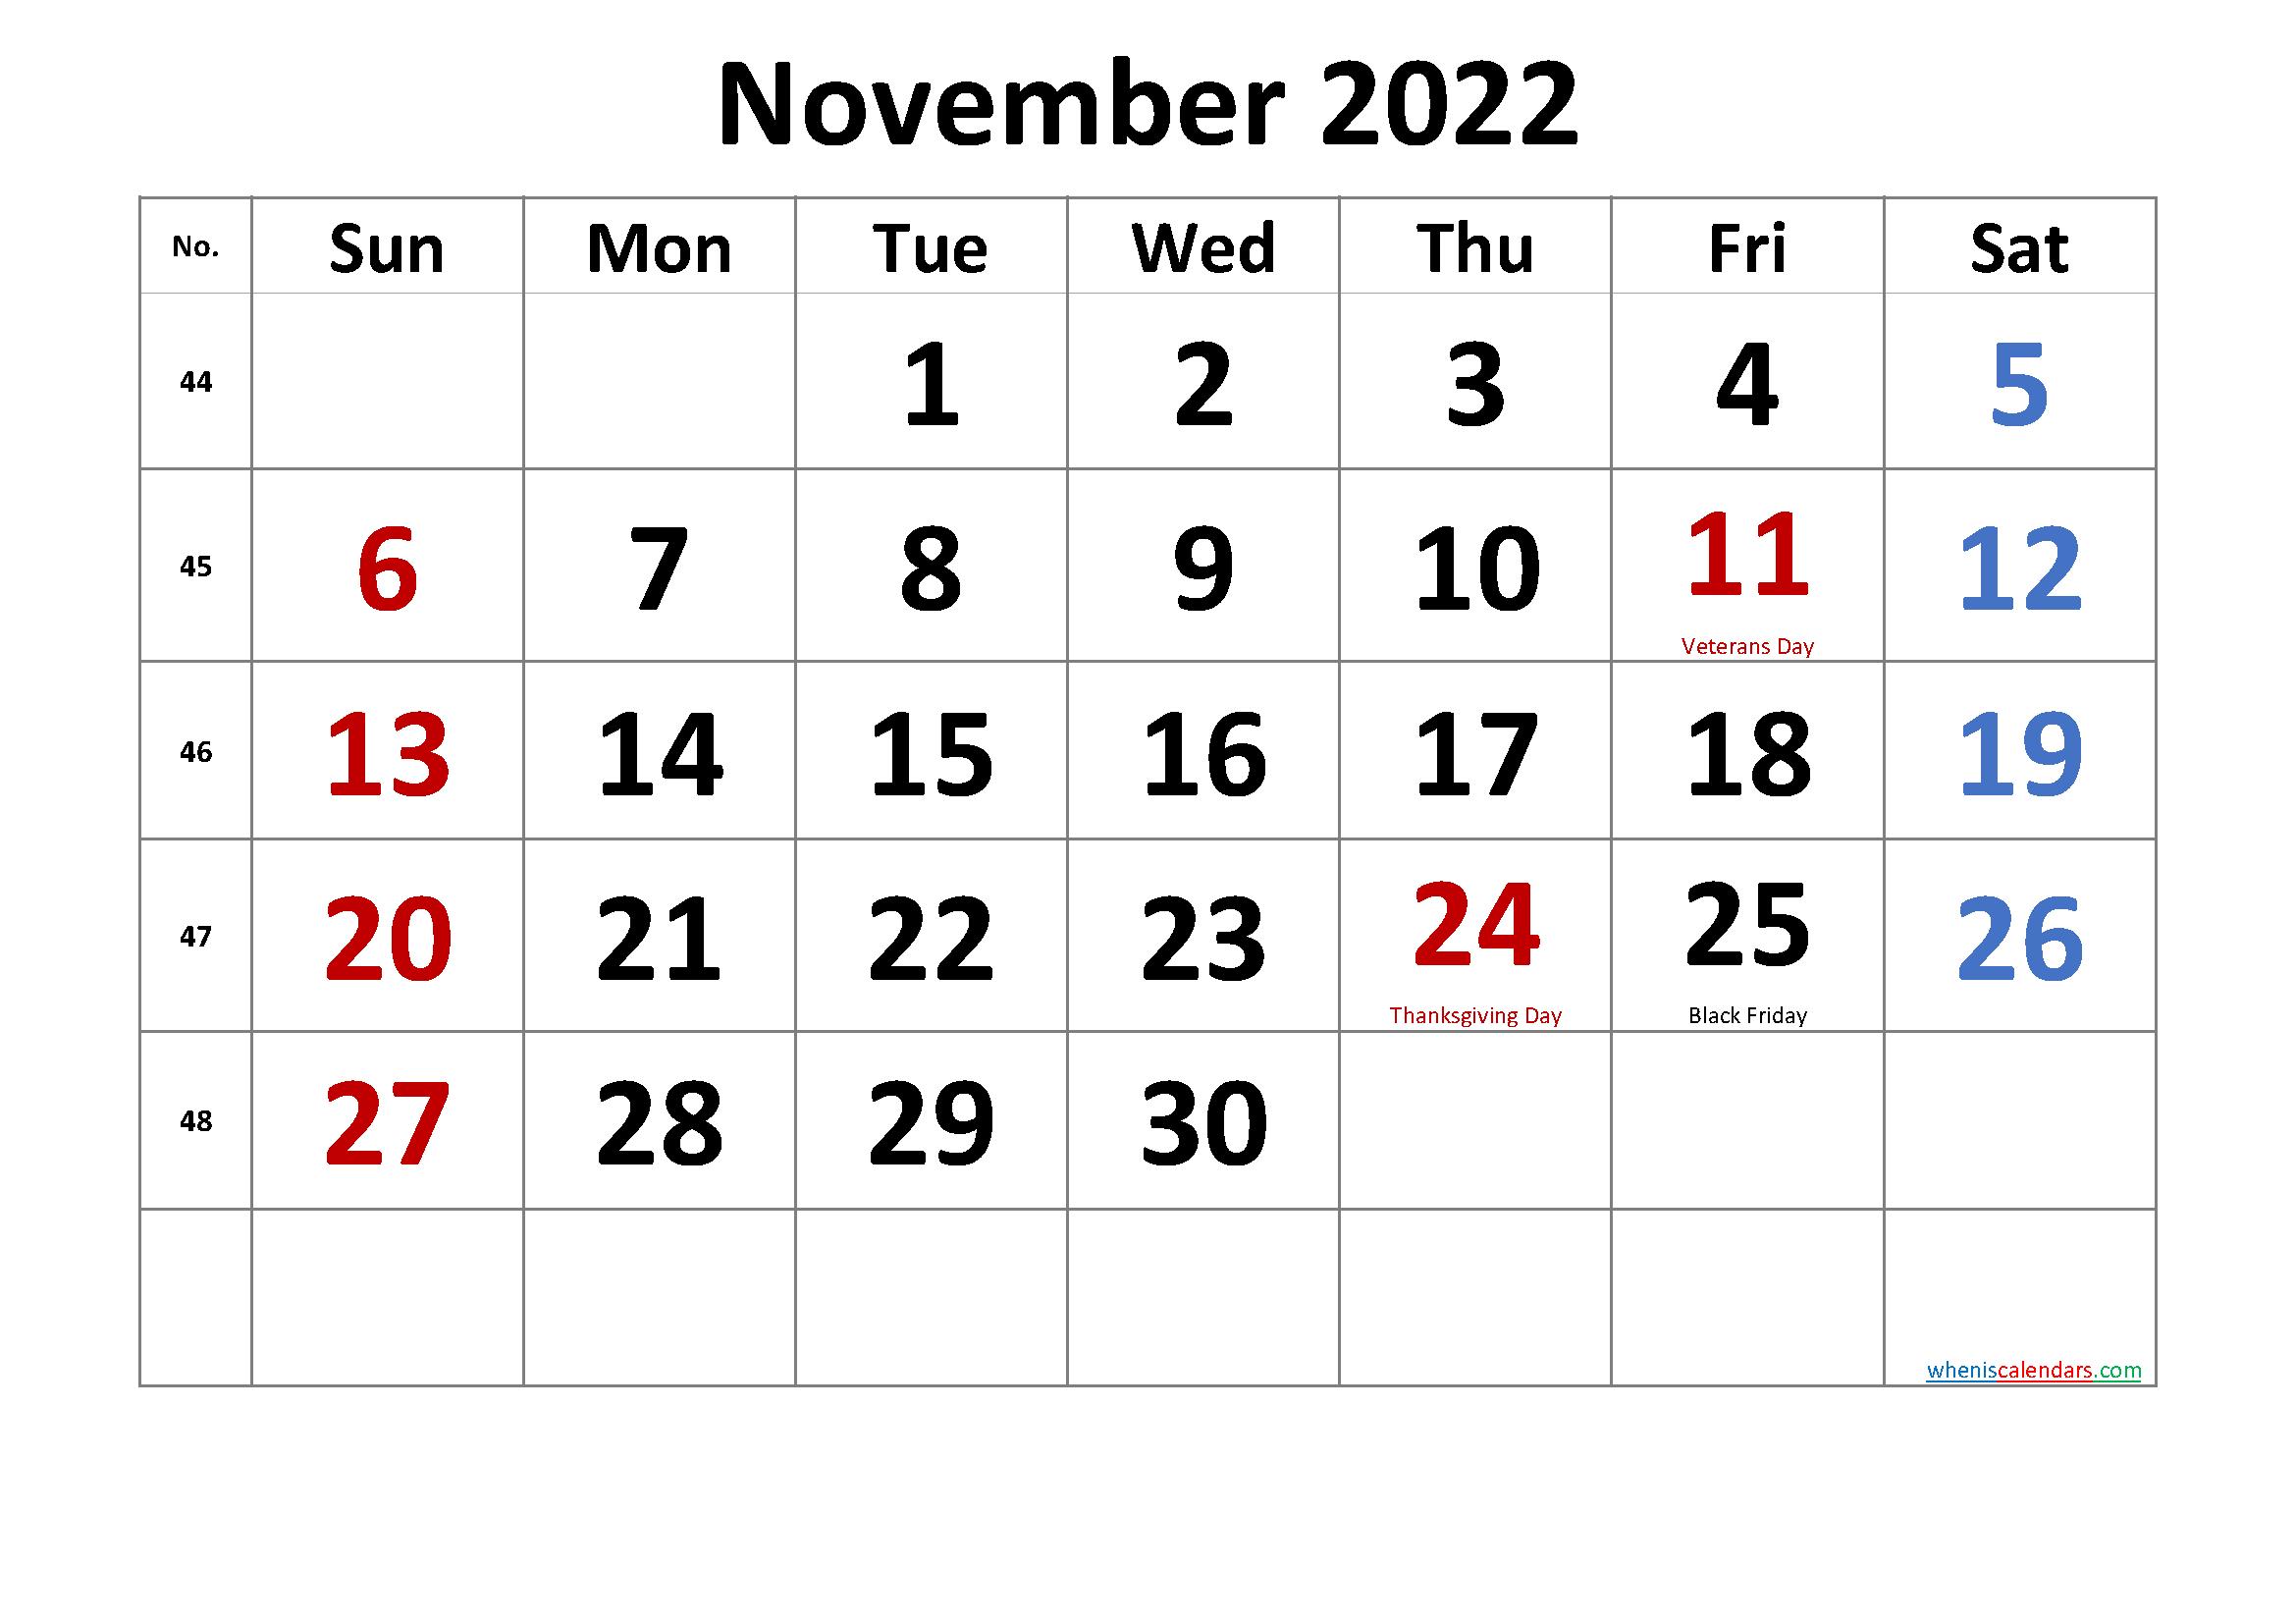 Printable November 2022 Calendar.Free Printable November 2022 Calendar Pdf And Png In 2020 Calendar Printables Calendar Word November Calendar